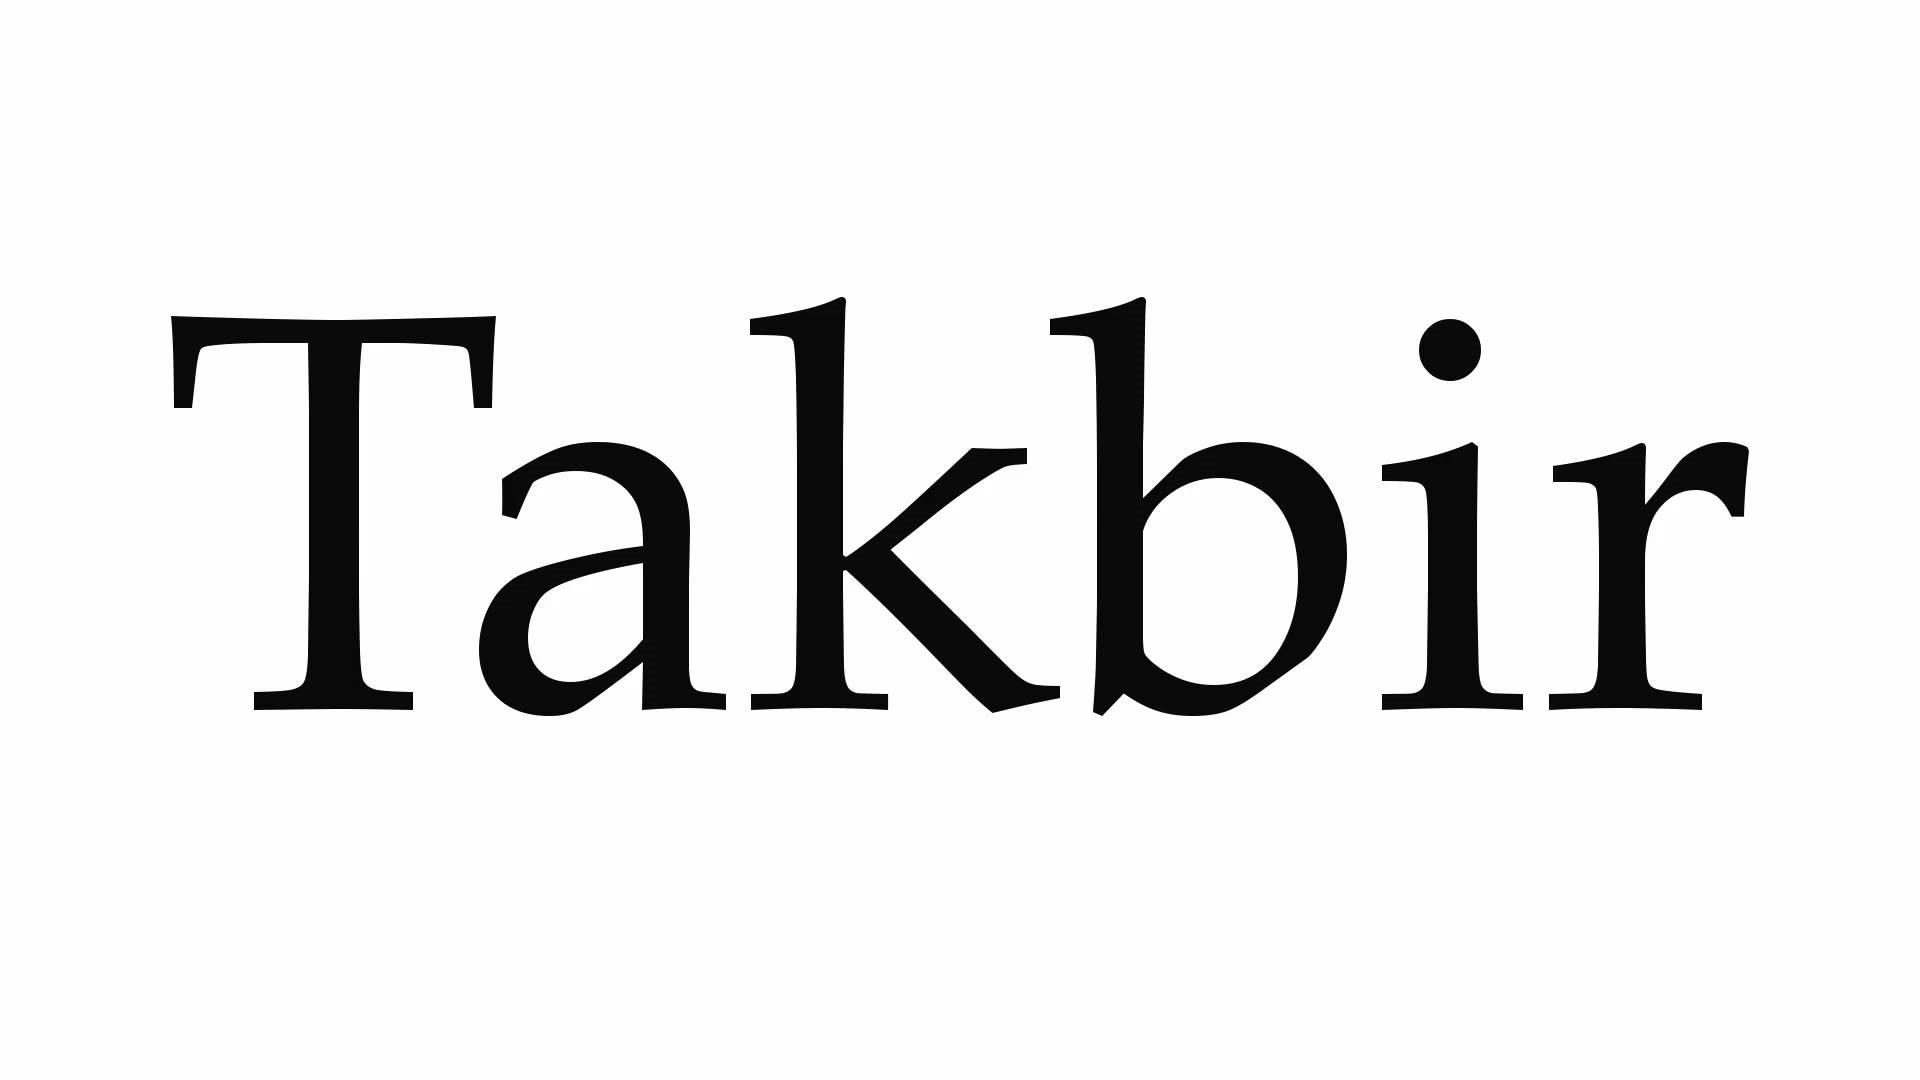 Takbir nos dias de Tashriq